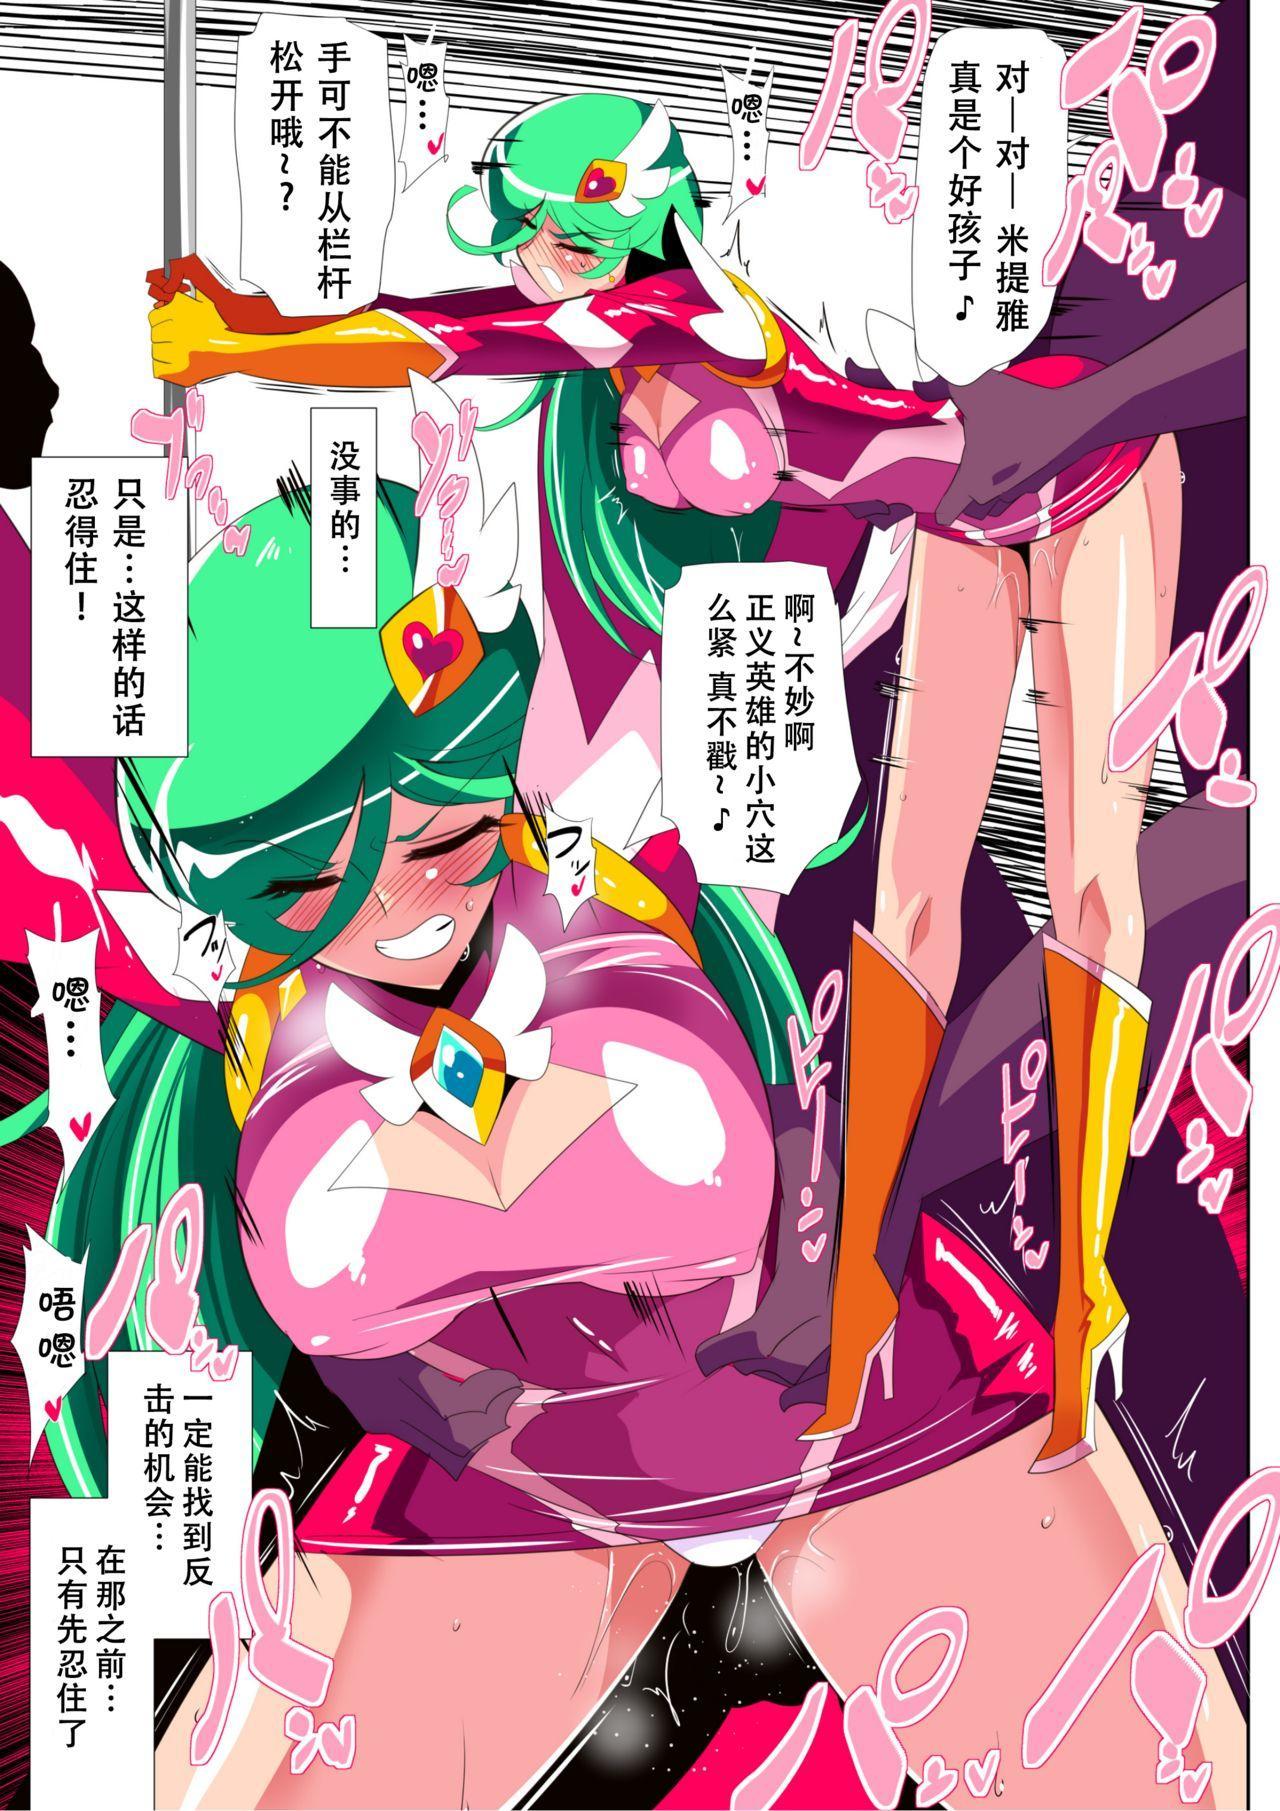 HEROINE LOSE 2 Psycho Lady Meteor Hen Psycho Power Heroine VS Kyousei Chikan Choukyou! 15